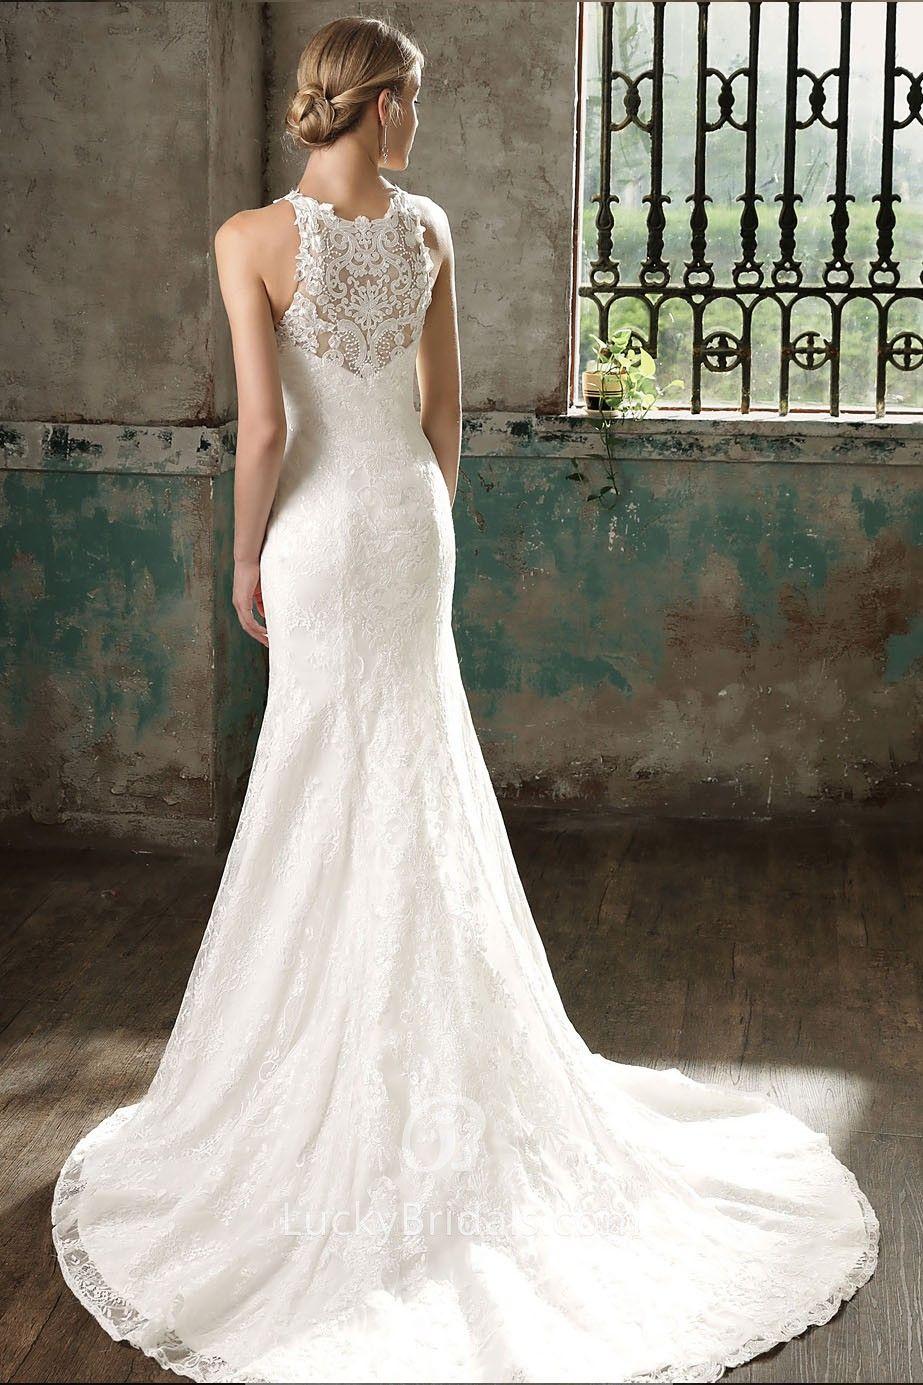 Unique Ivory Lace Halter Mermaid Long Wedding Dress Wedding Dress Train Chapel Train Wedding Dress Long Wedding Dresses [ 1385 x 923 Pixel ]